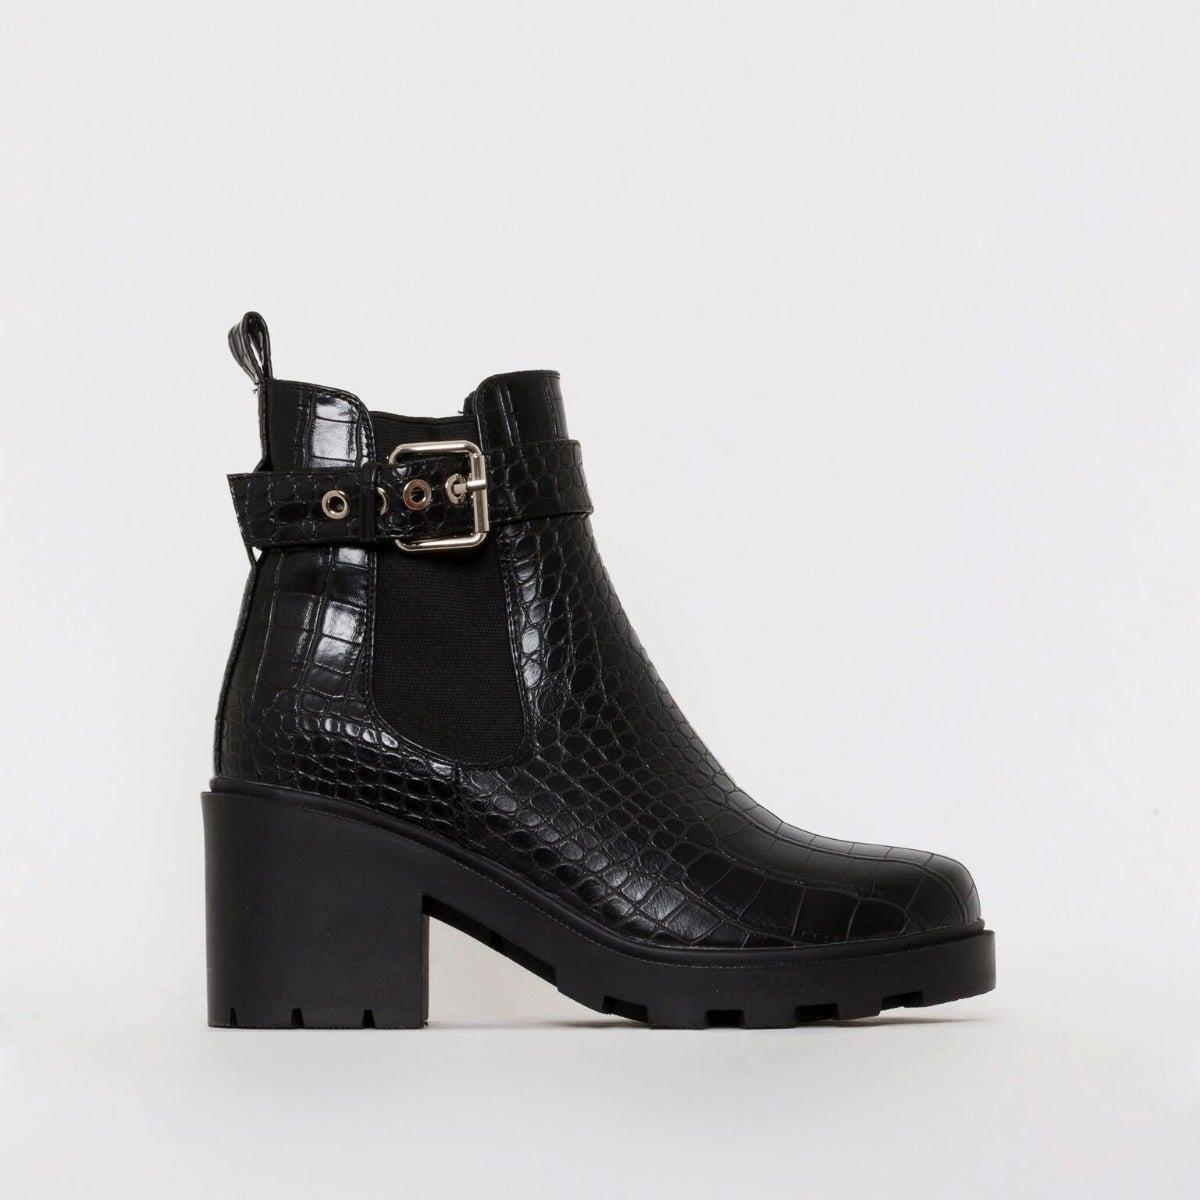 Tori Black Croc Print Chelsea Ankle Boots